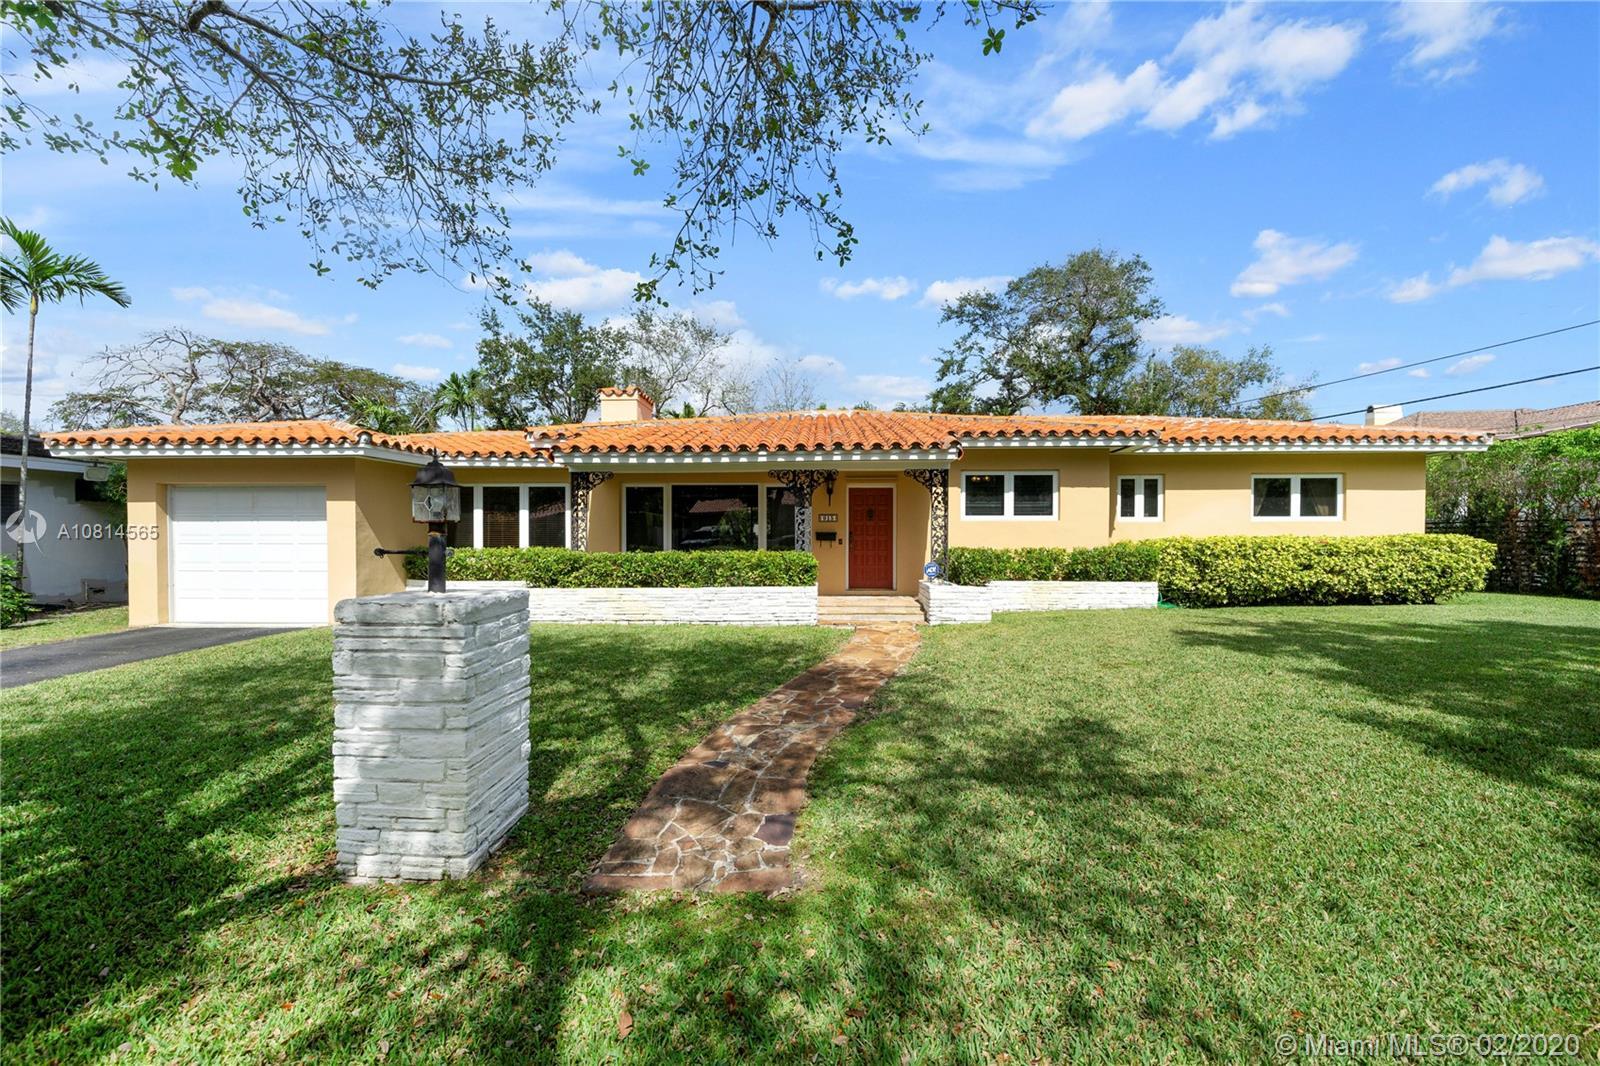 915 Osorio Ave, Coral Gables, FL 33146 - Coral Gables, FL real estate listing